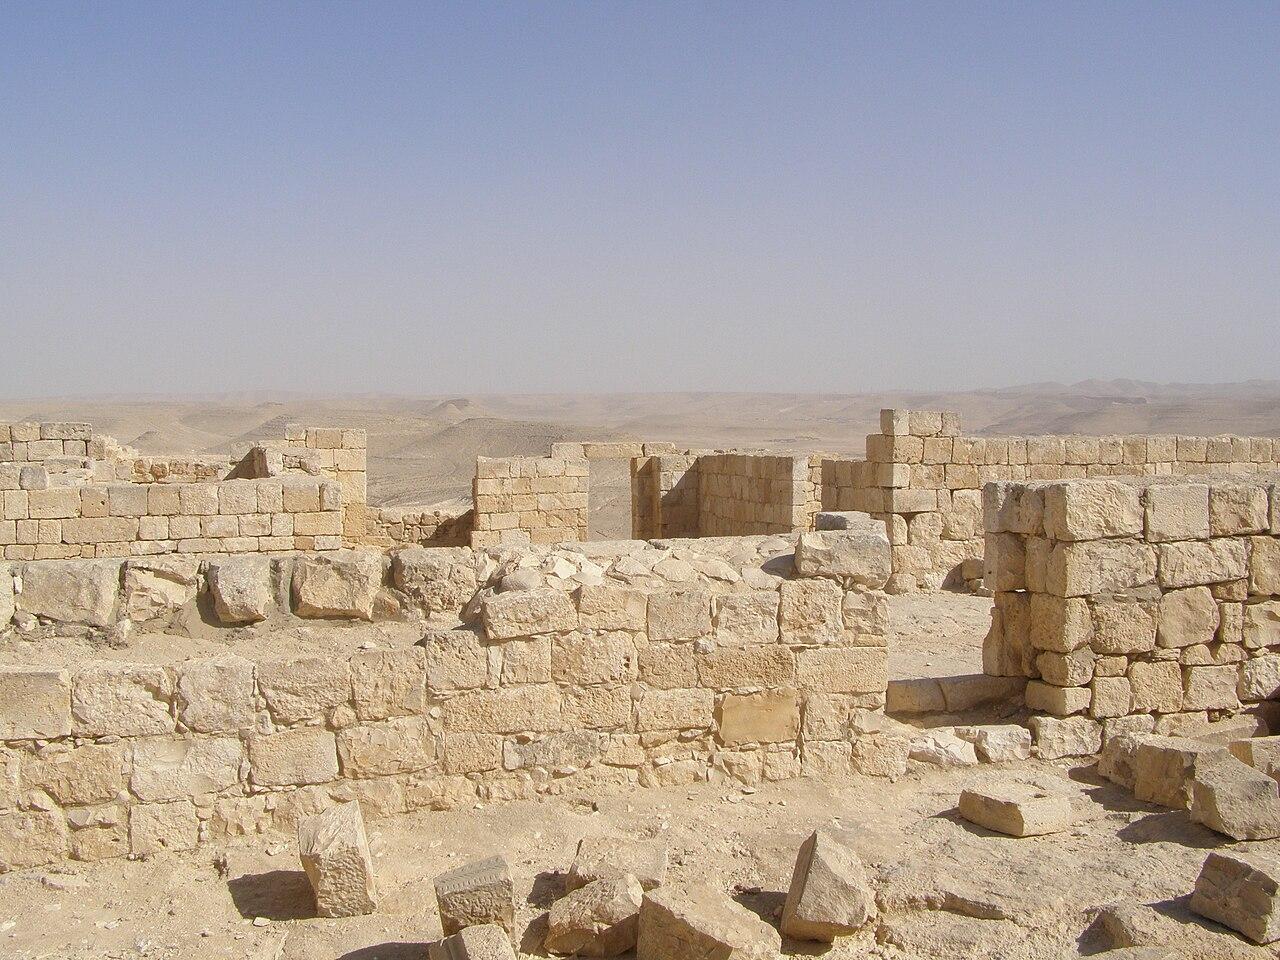 File:Avdat, sacred precinct 04.jpg - Wikimedia Commons